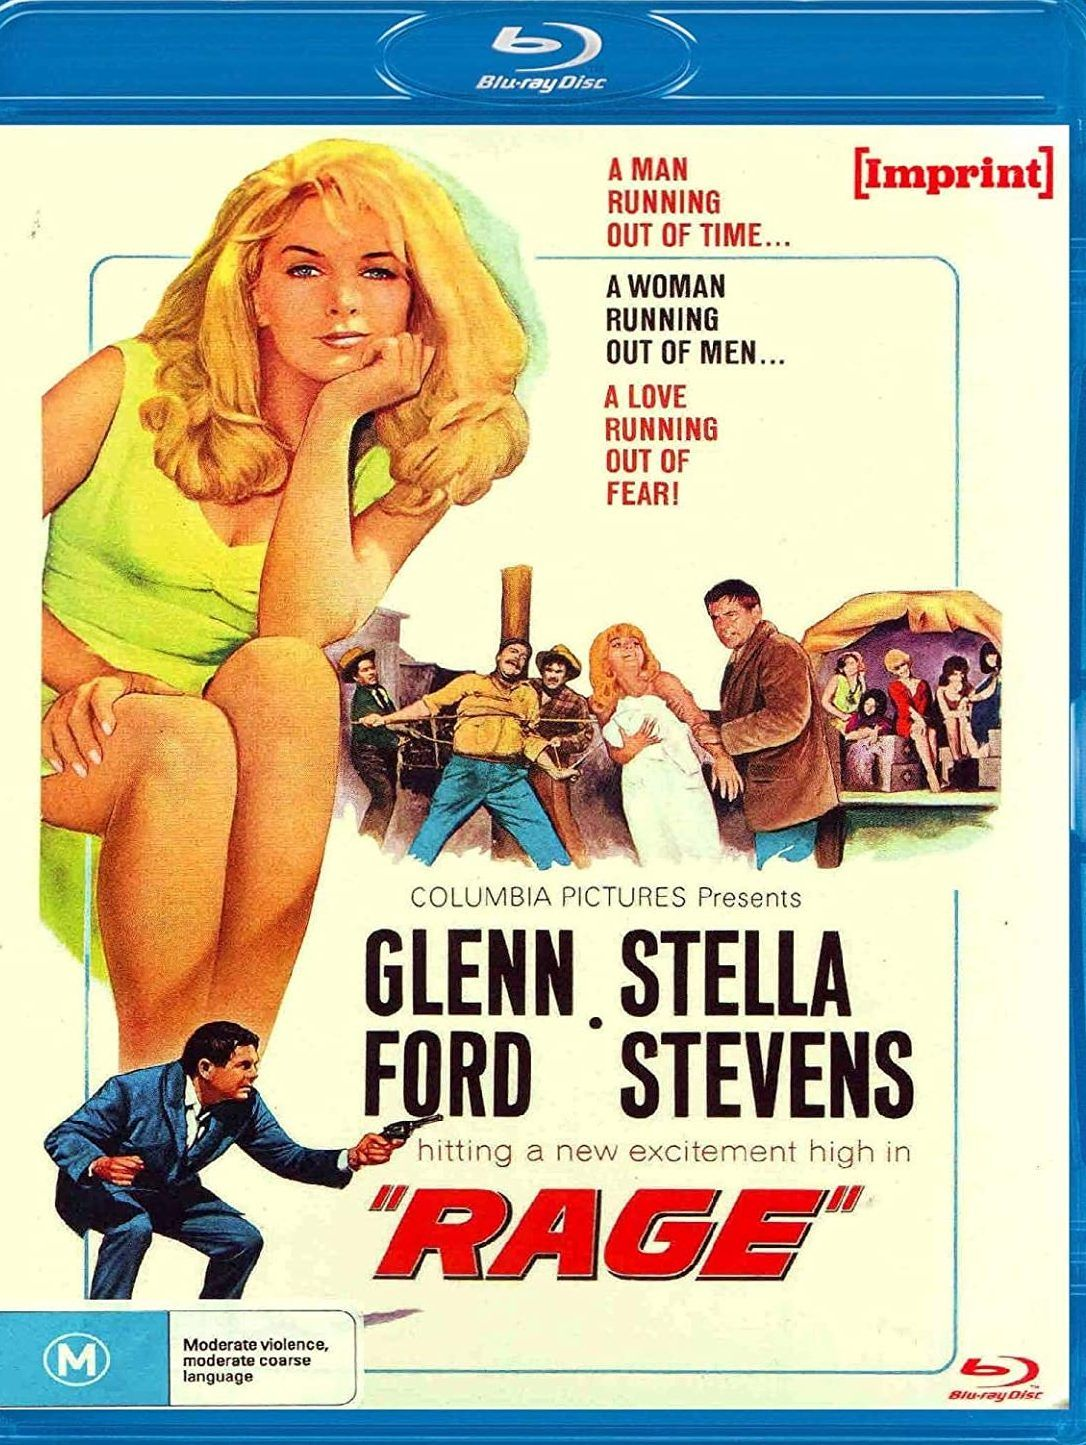 Dvdbeaver On Twitter In 2021 Running Women Rage Columbia Pictures